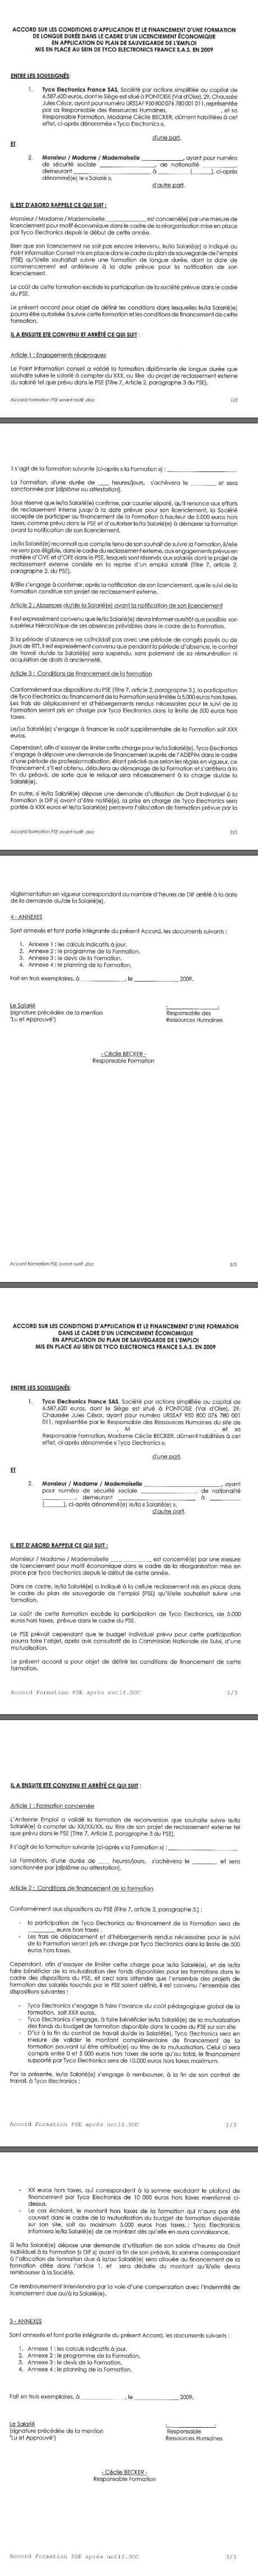 Accord unilattéral clabe/tyco formation PSE tef sas